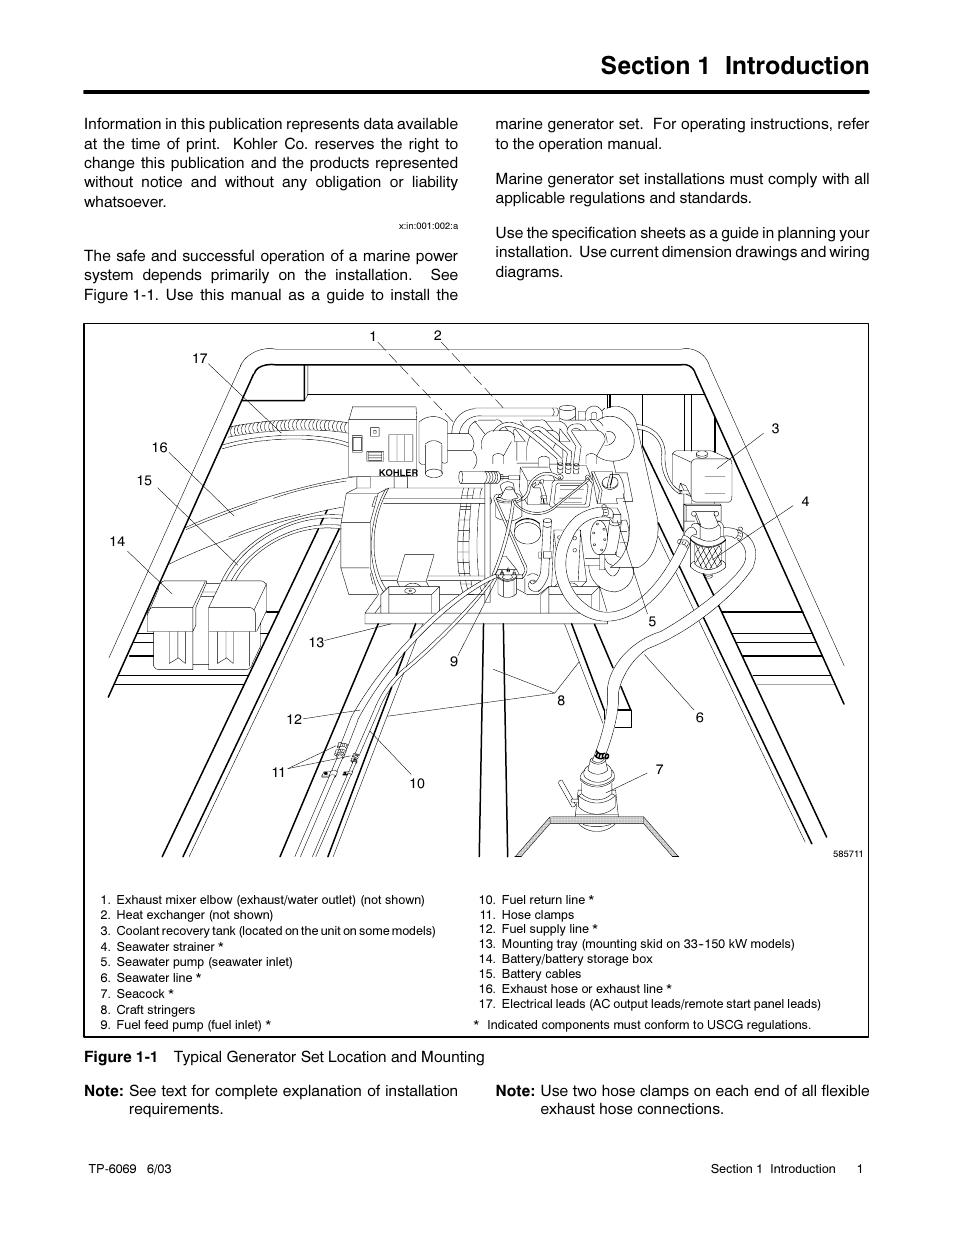 Kohler 7 3 Marine Generator Service Manual Engine 6 4 Cz Electrical Diagram Sets 11efoz 13eoz User Page 11 92 Also